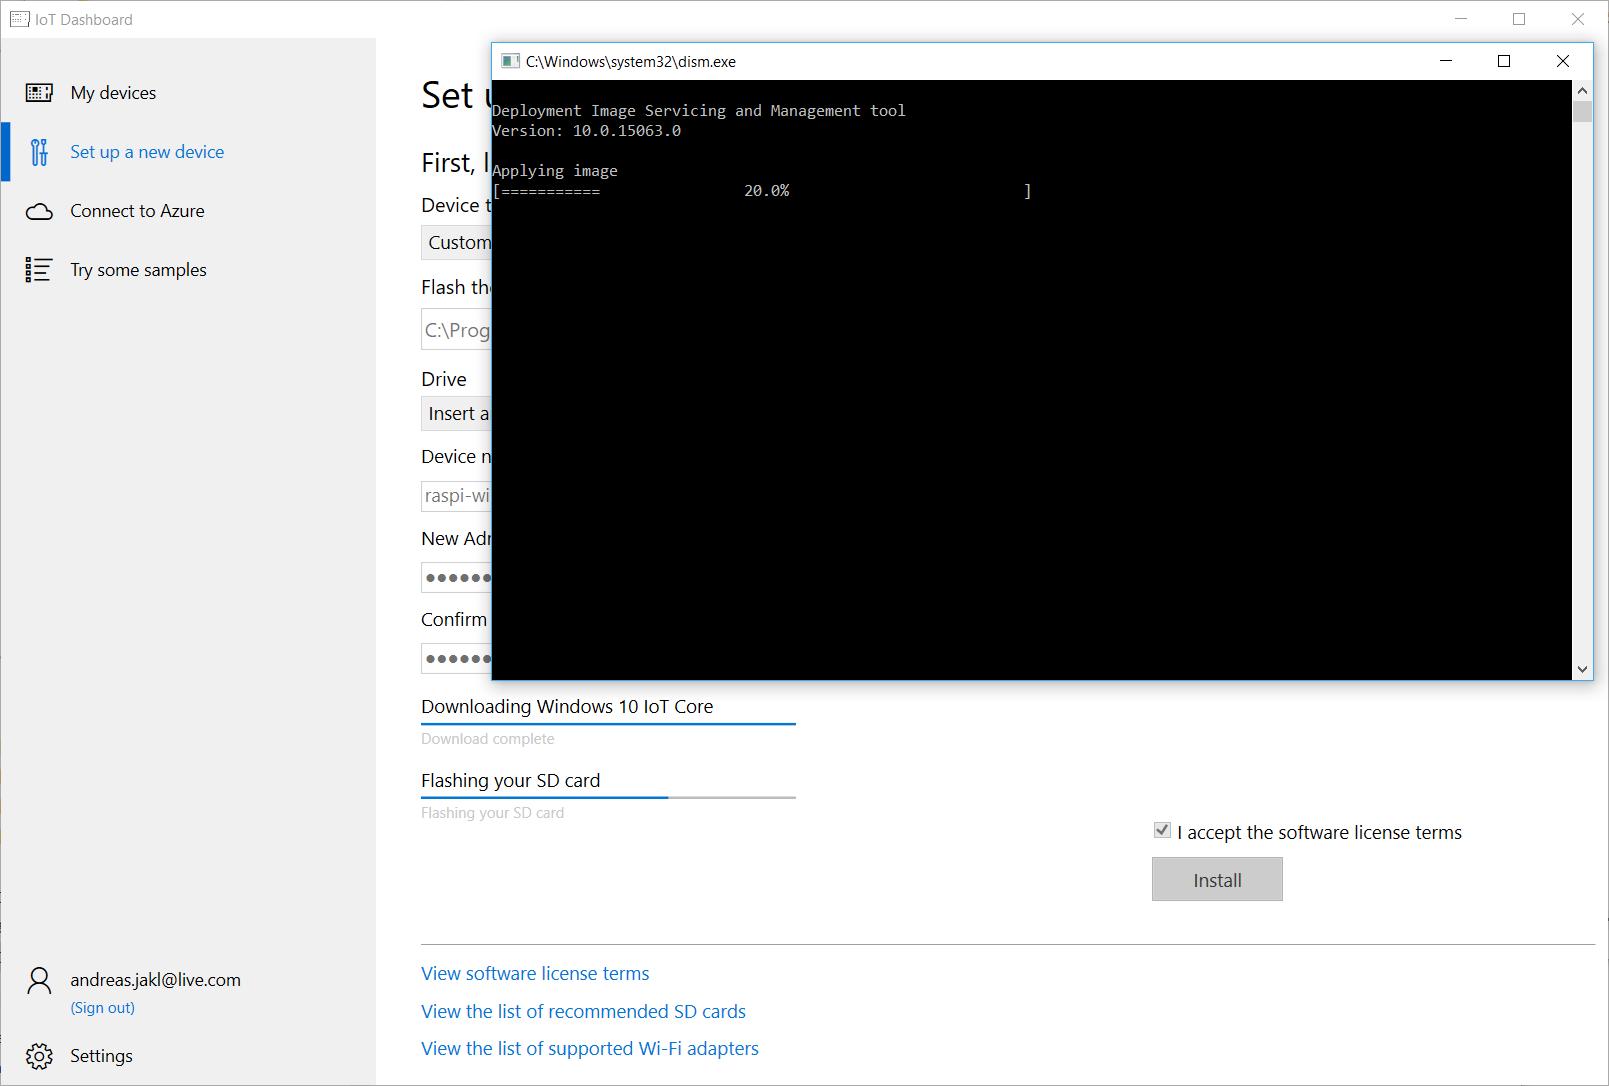 Installing Windows 10 IoT Core on a Raspberry Pi – andreasjakl com